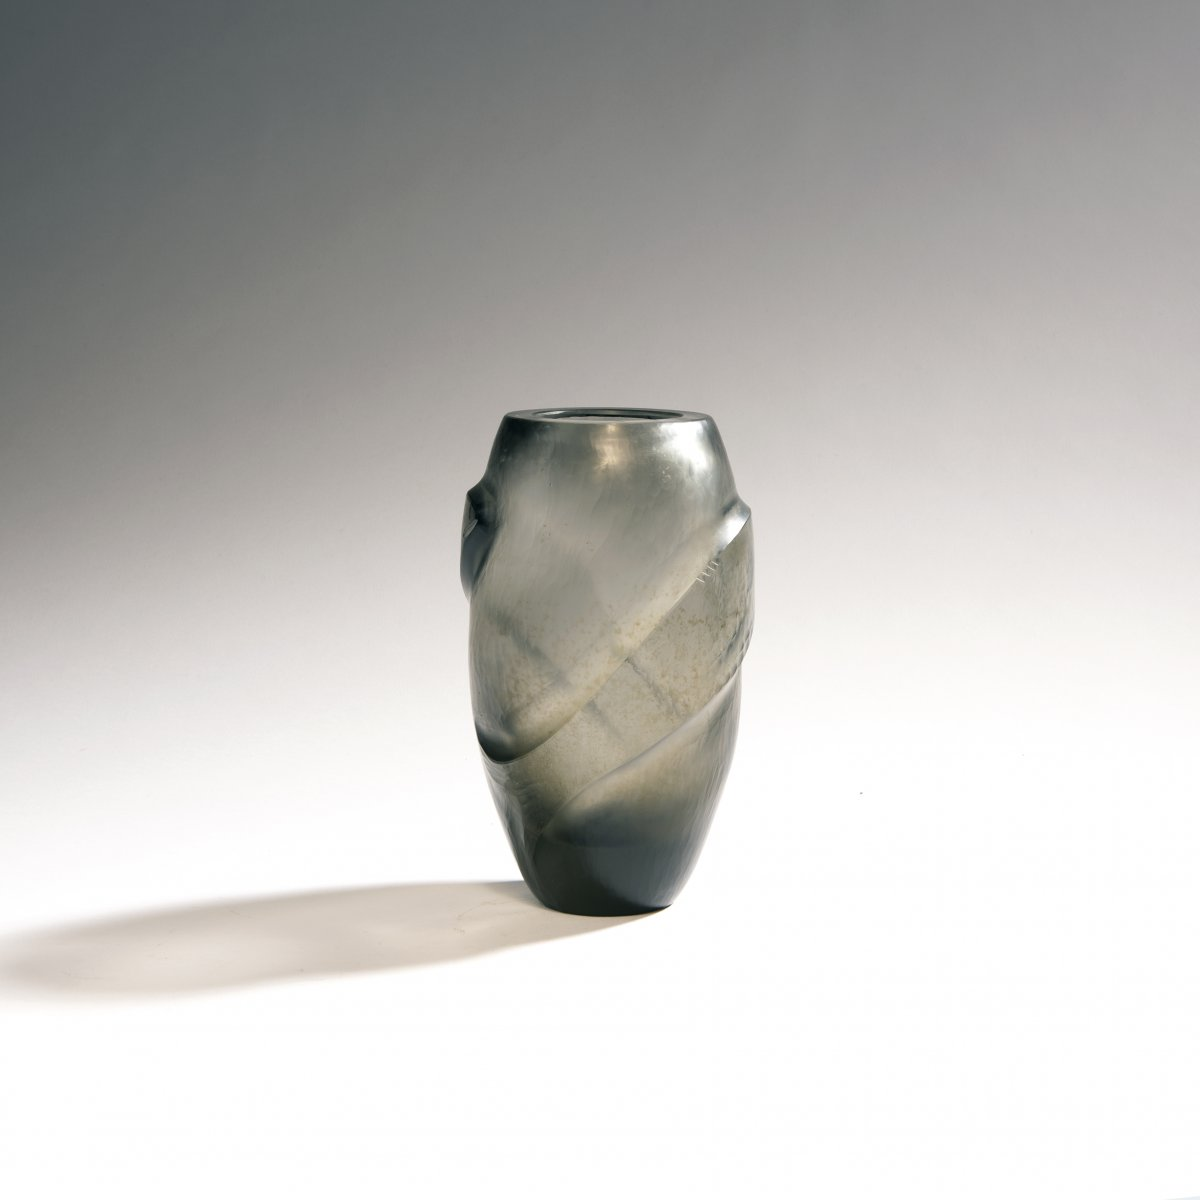 Lot 501 - Carlo ScarpaVase 'Inciso', 1940-42Schlanke Ovalform. H. 19 cm. Ausführung: Venini & C. Graues